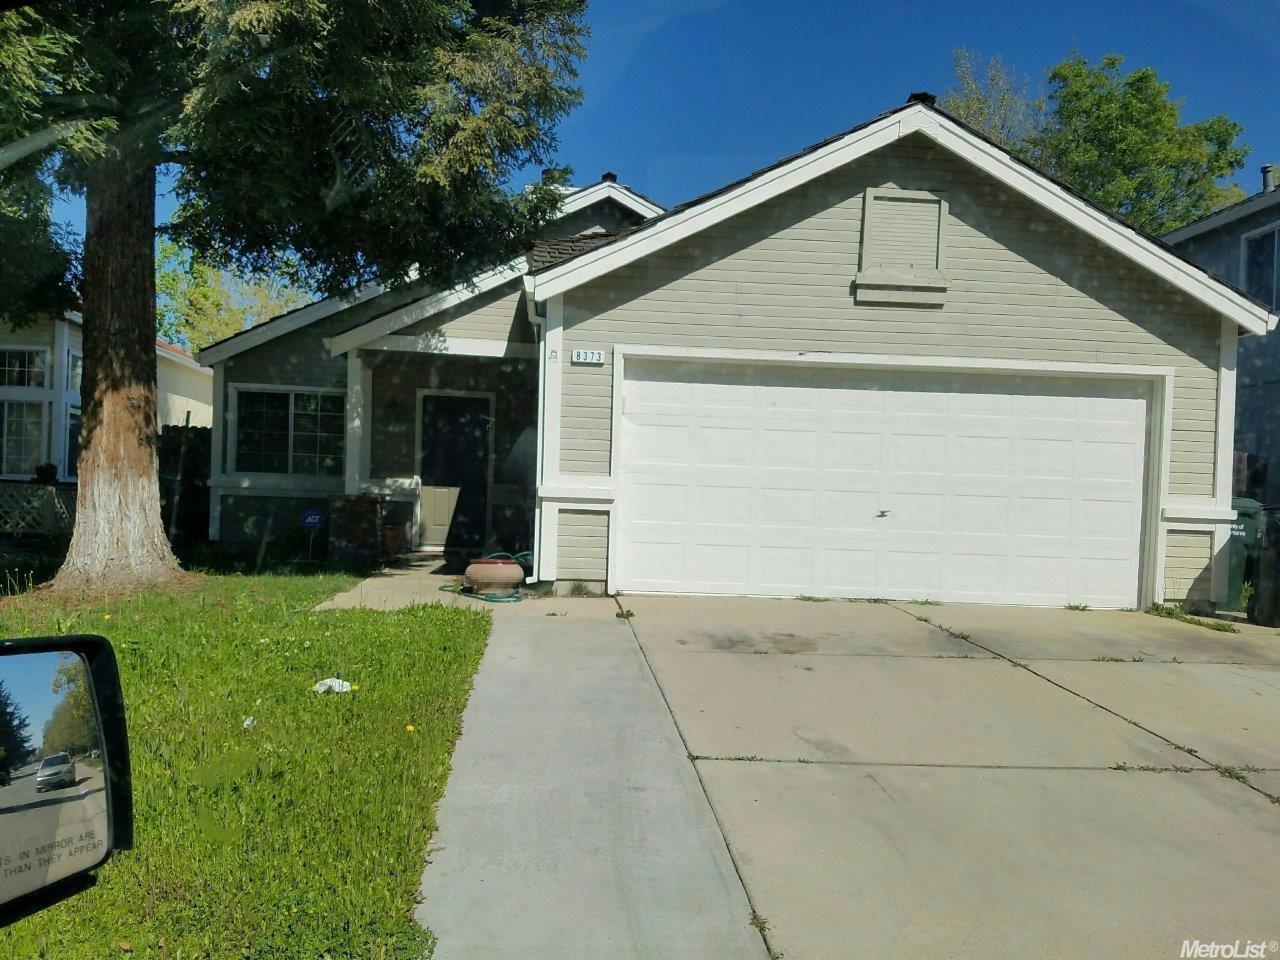 8373 Hillsbrook Dr, Antelope, CA